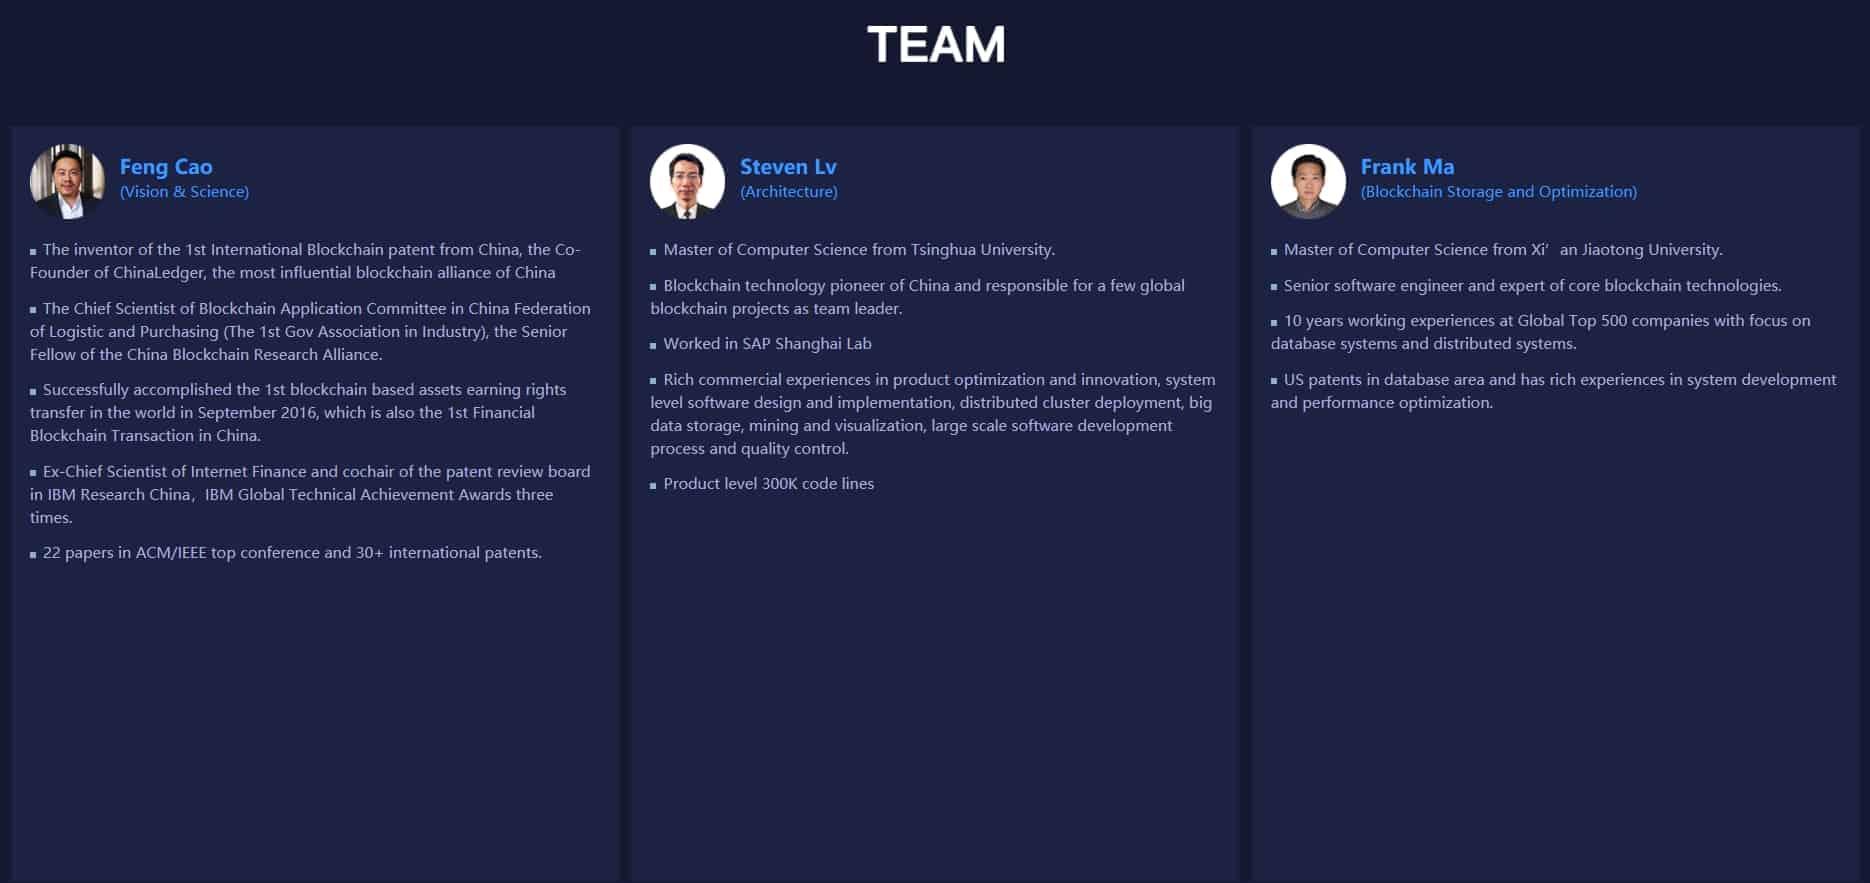 pchain core team members